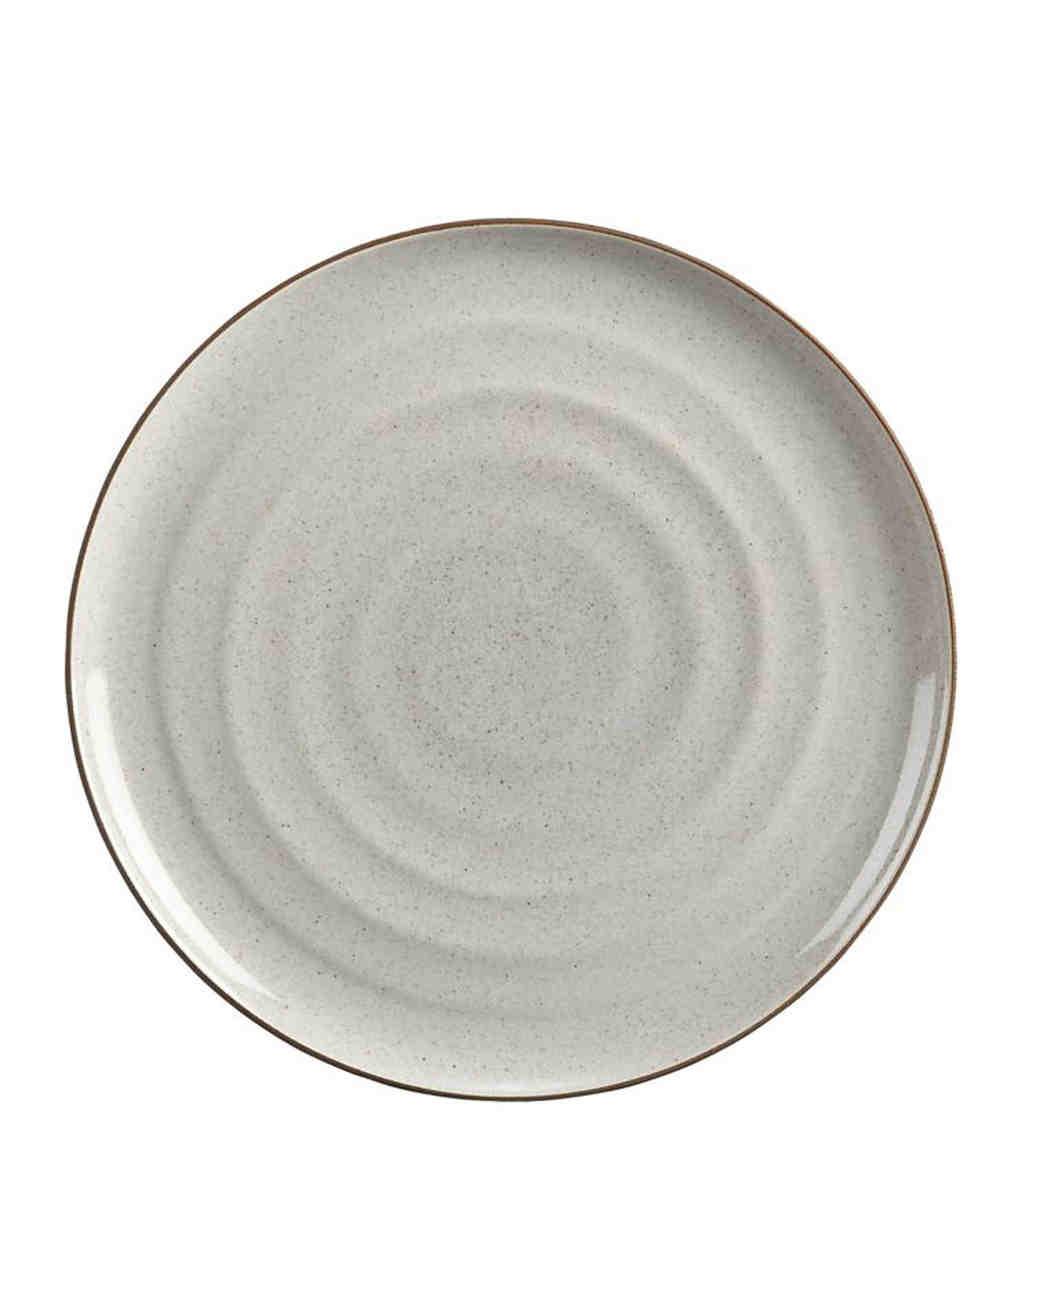 china-registry-global-crate-barrel-18th-st-dinner-plate-1014.jpg